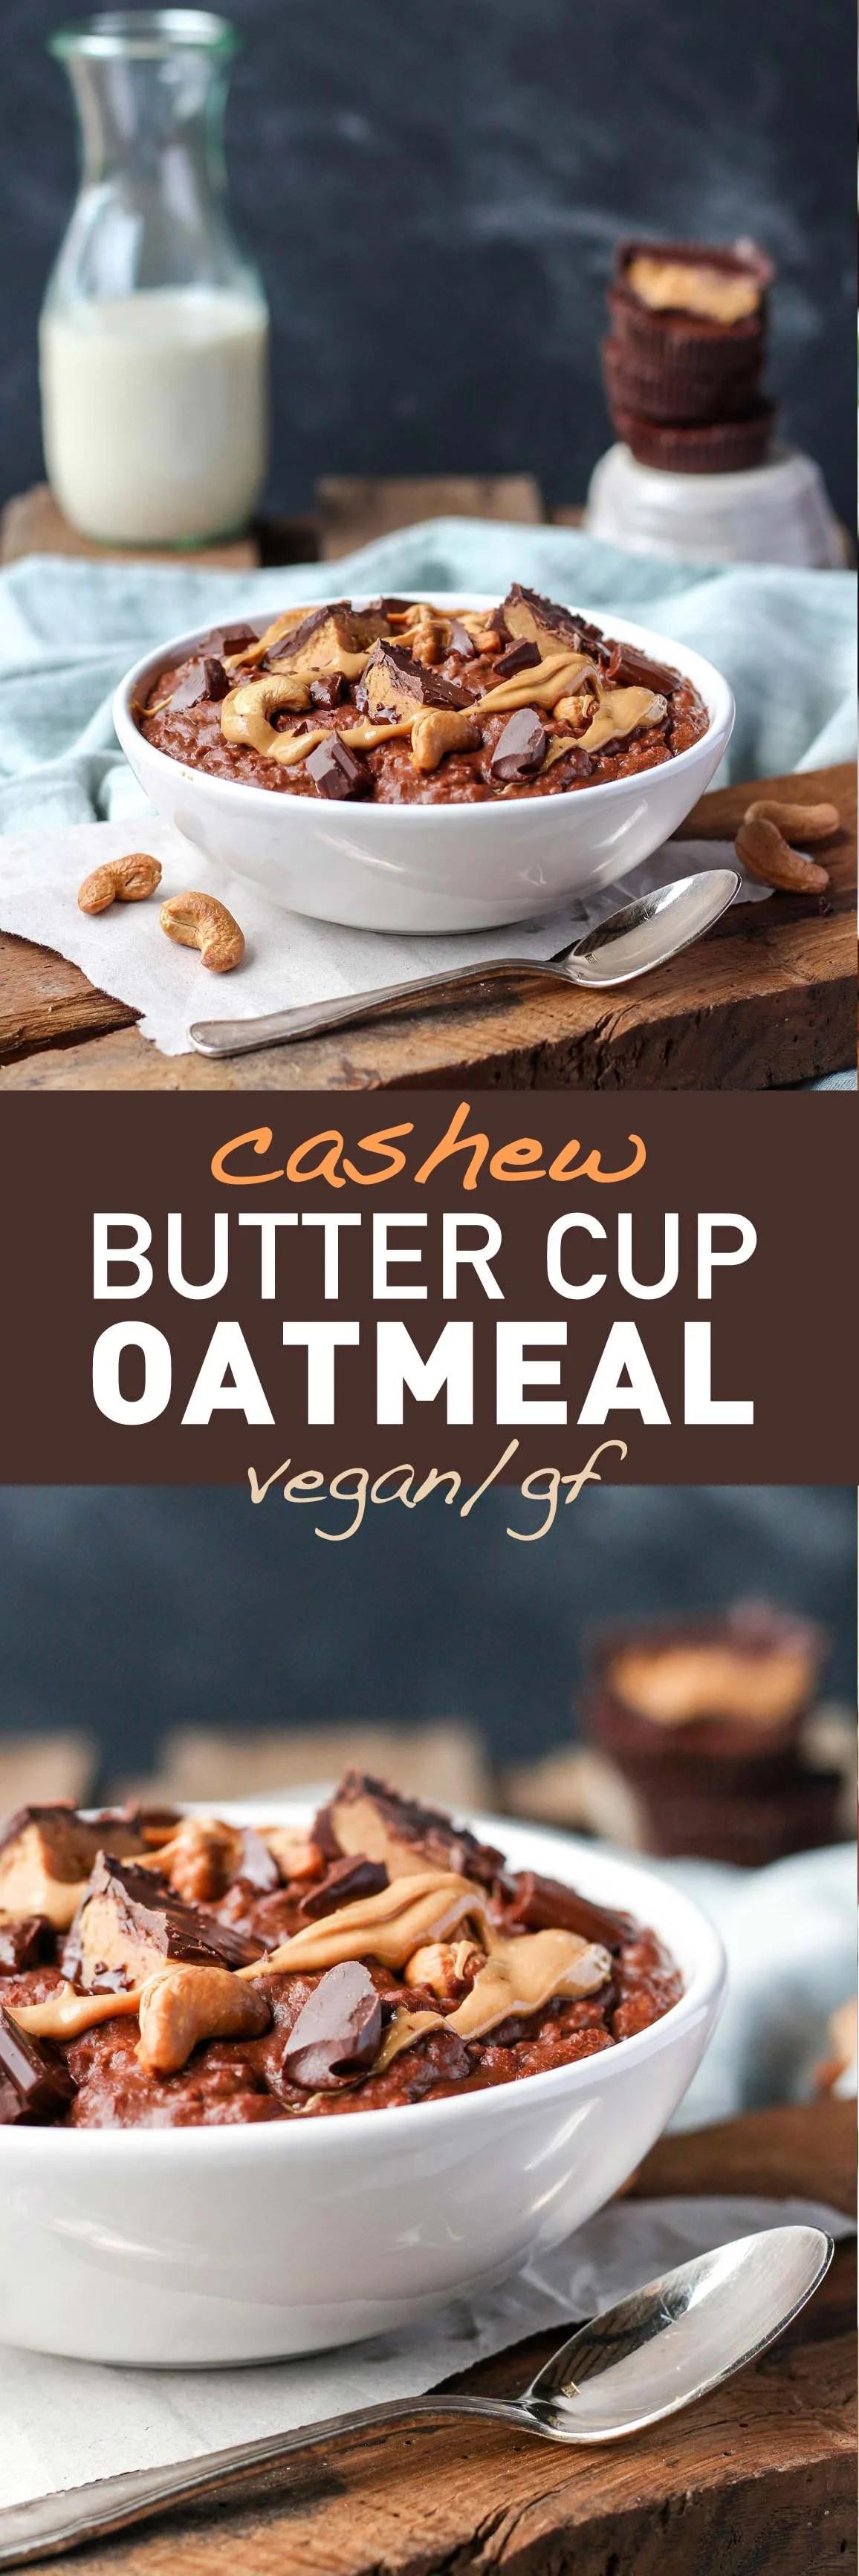 Cashew Butter Cup Oatmeal